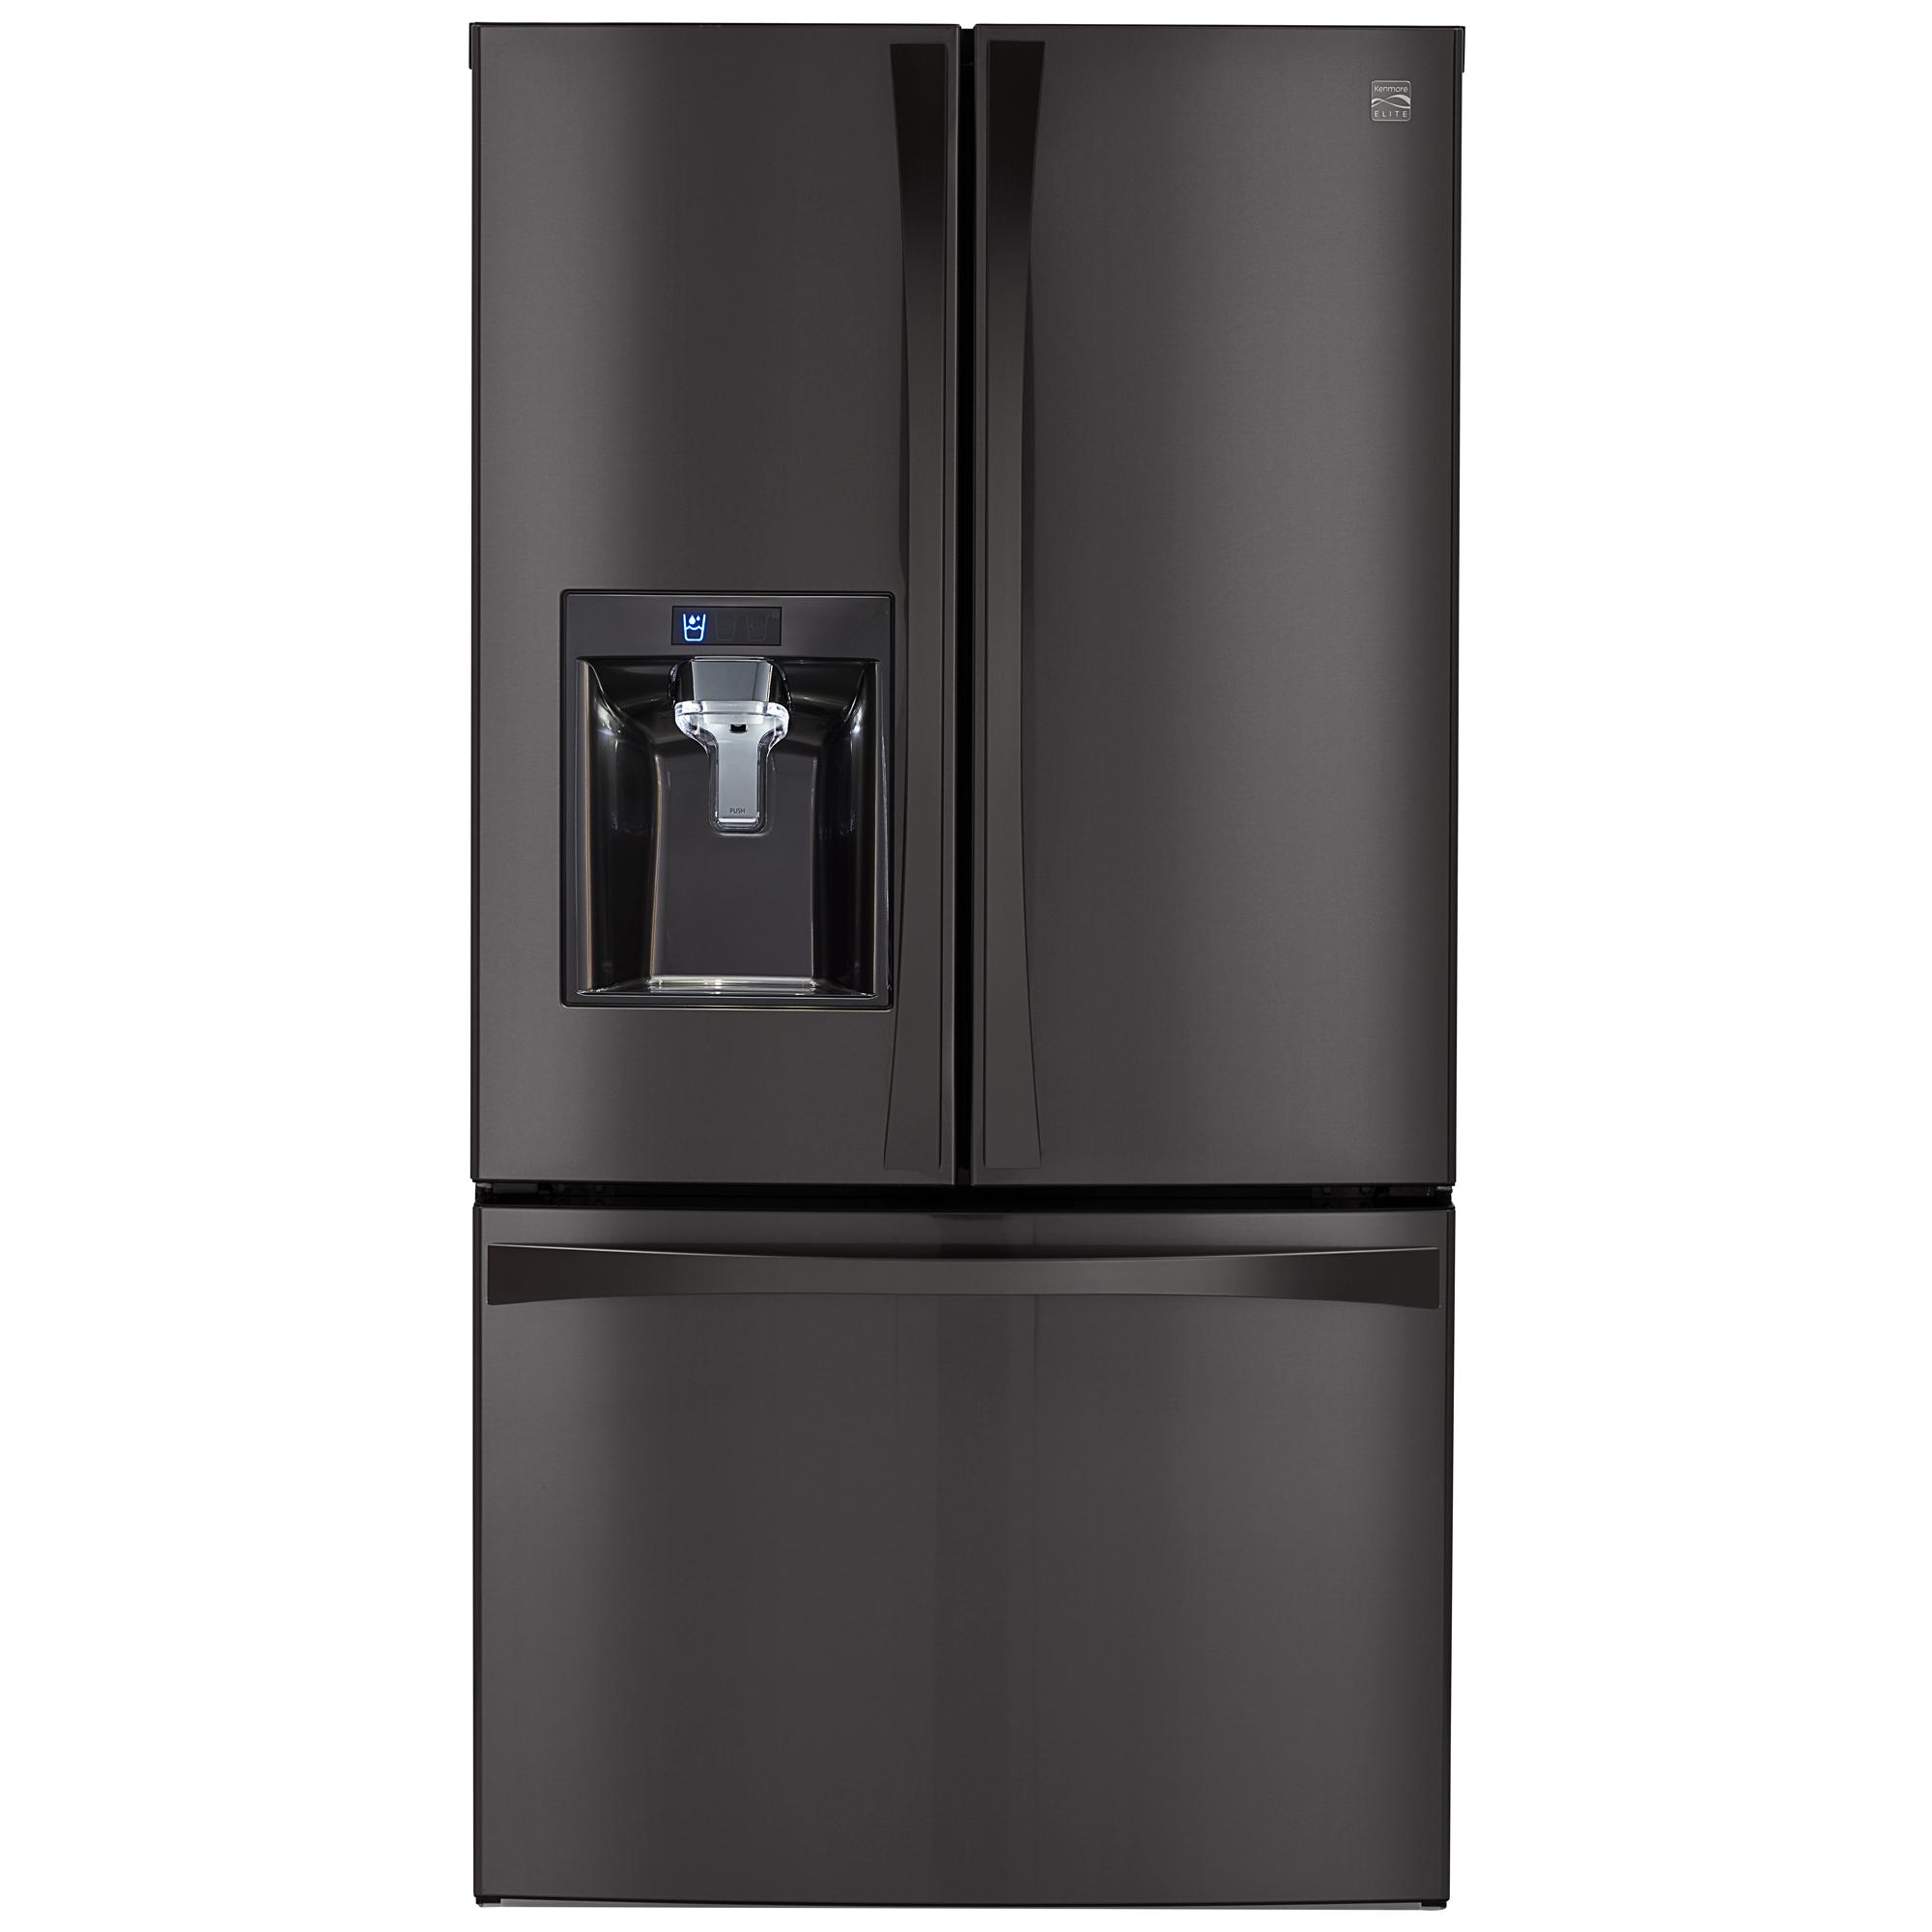 Kenmore Elite 74027 29.8 Cu. Ft. French Door Bottom-freezer Refrigerator - Black Stainless Steel